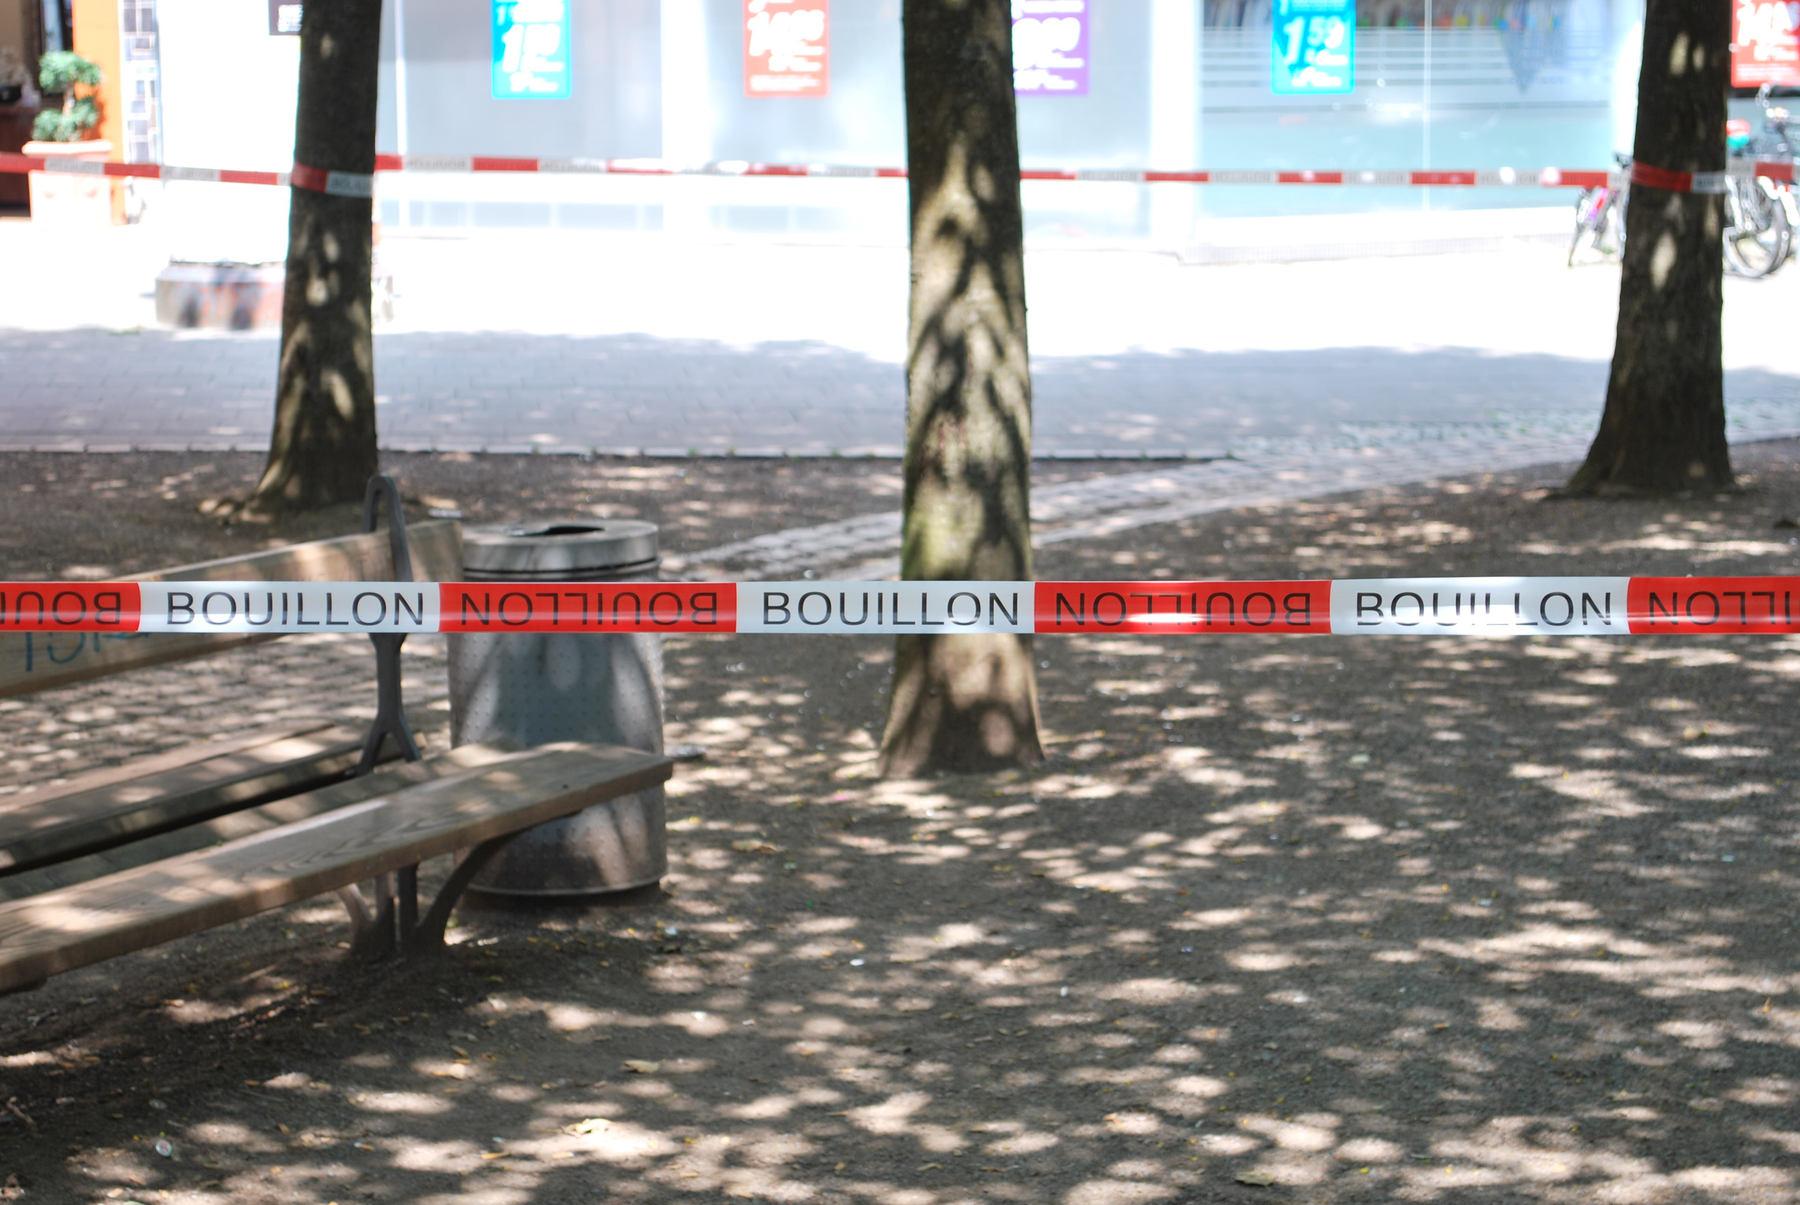 BouillonGroup-SPEZIALEINHEIT-BOUILLON-1